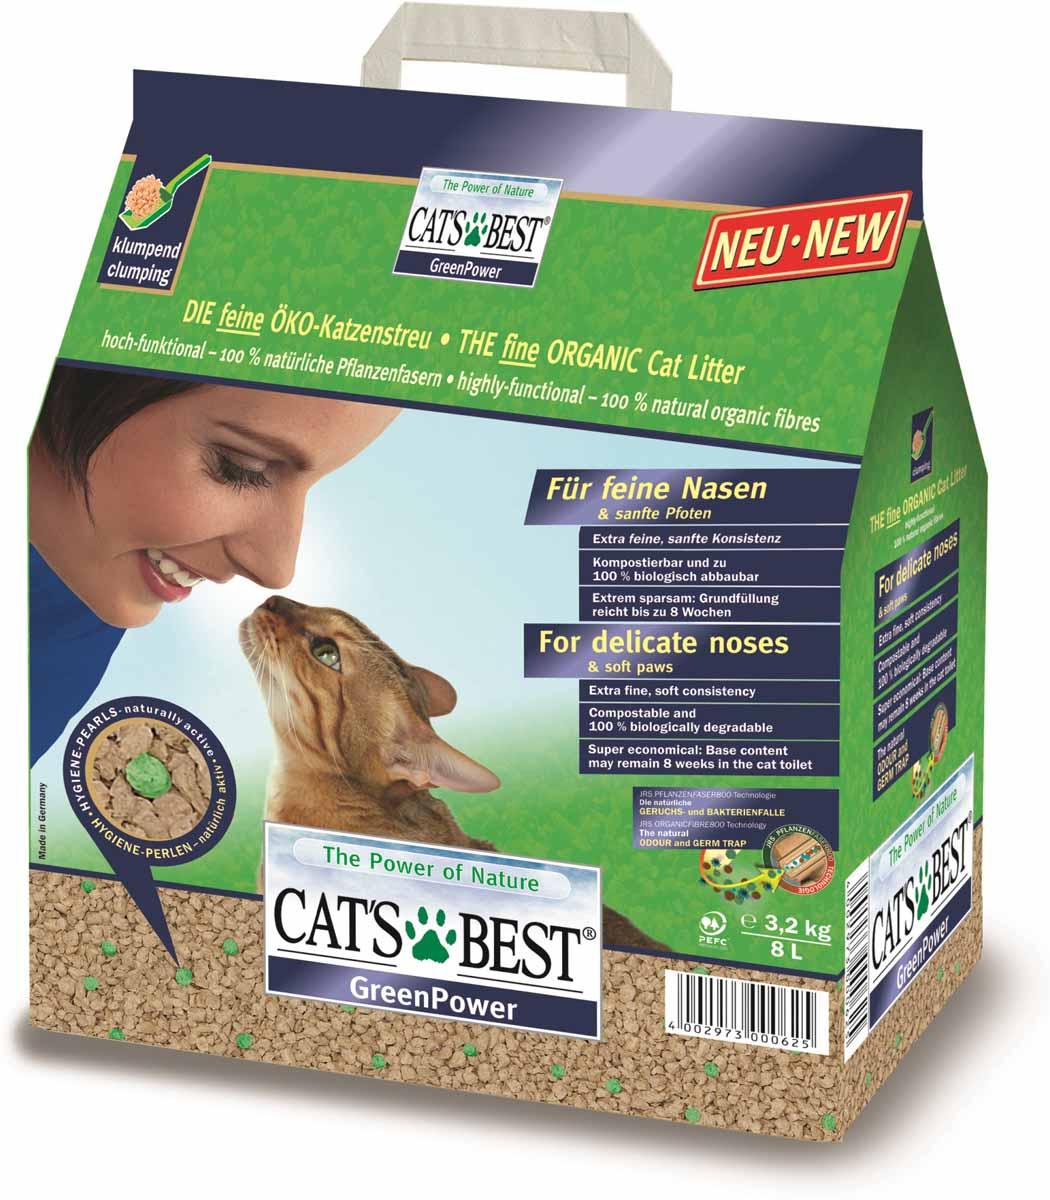 Cats Best Green Power Наполнитель древесный впитывающий 8л*3,2кг